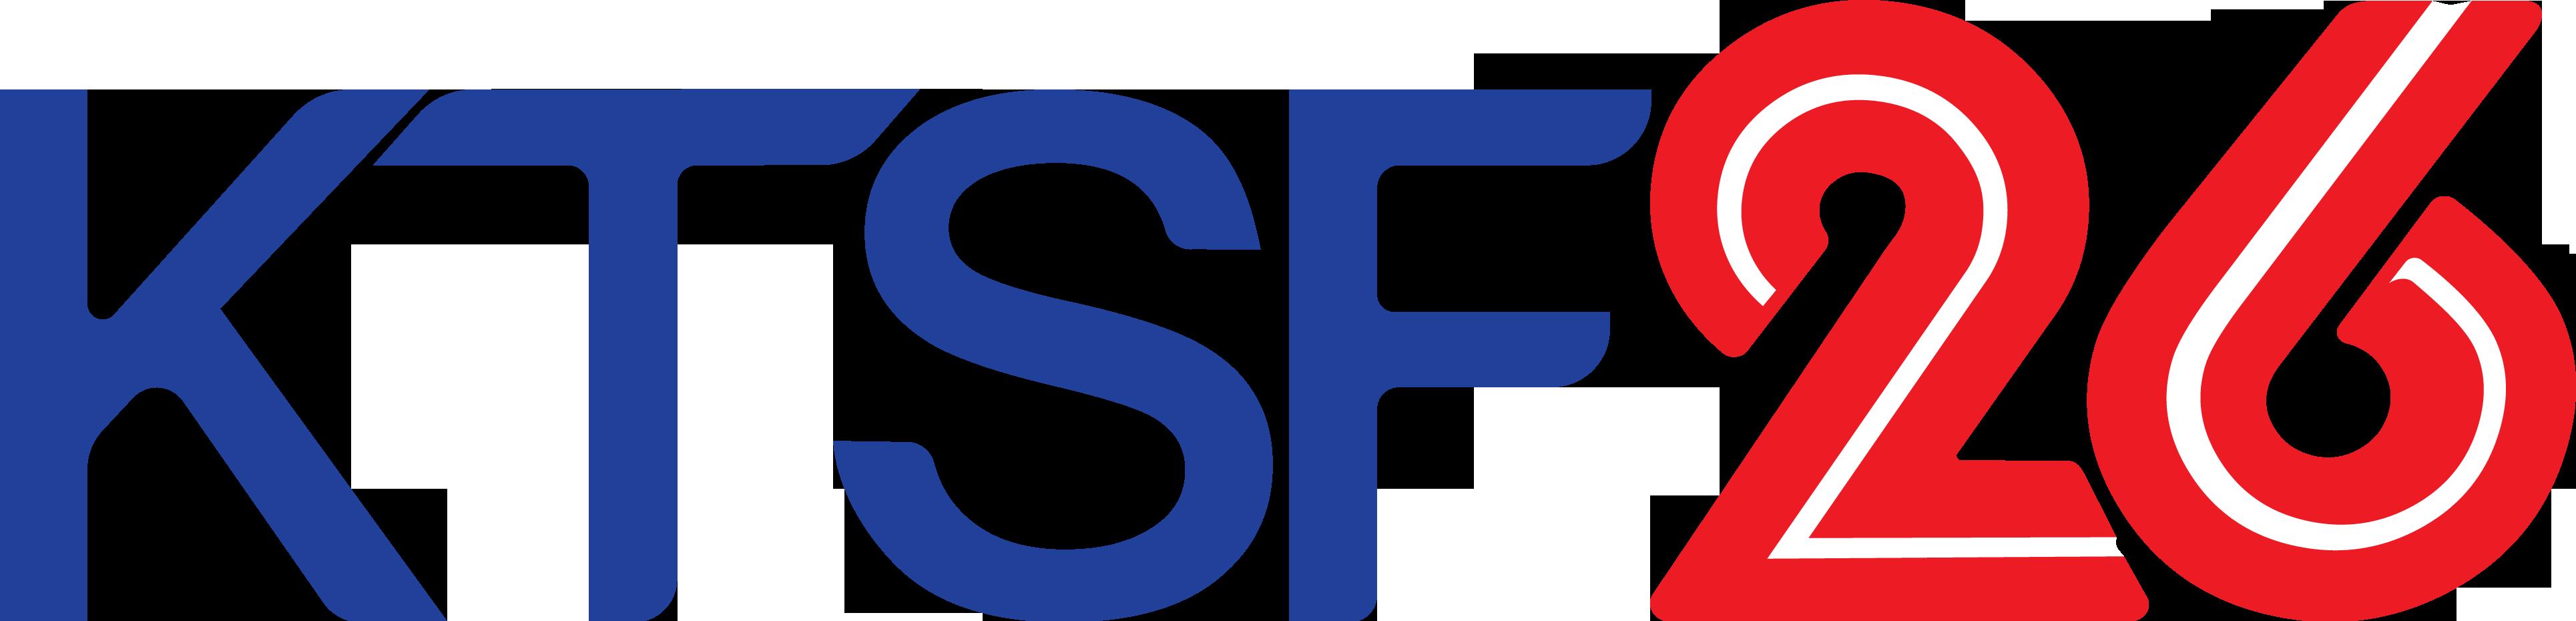 KTSF Channel 26 – San Francisco Bay Area